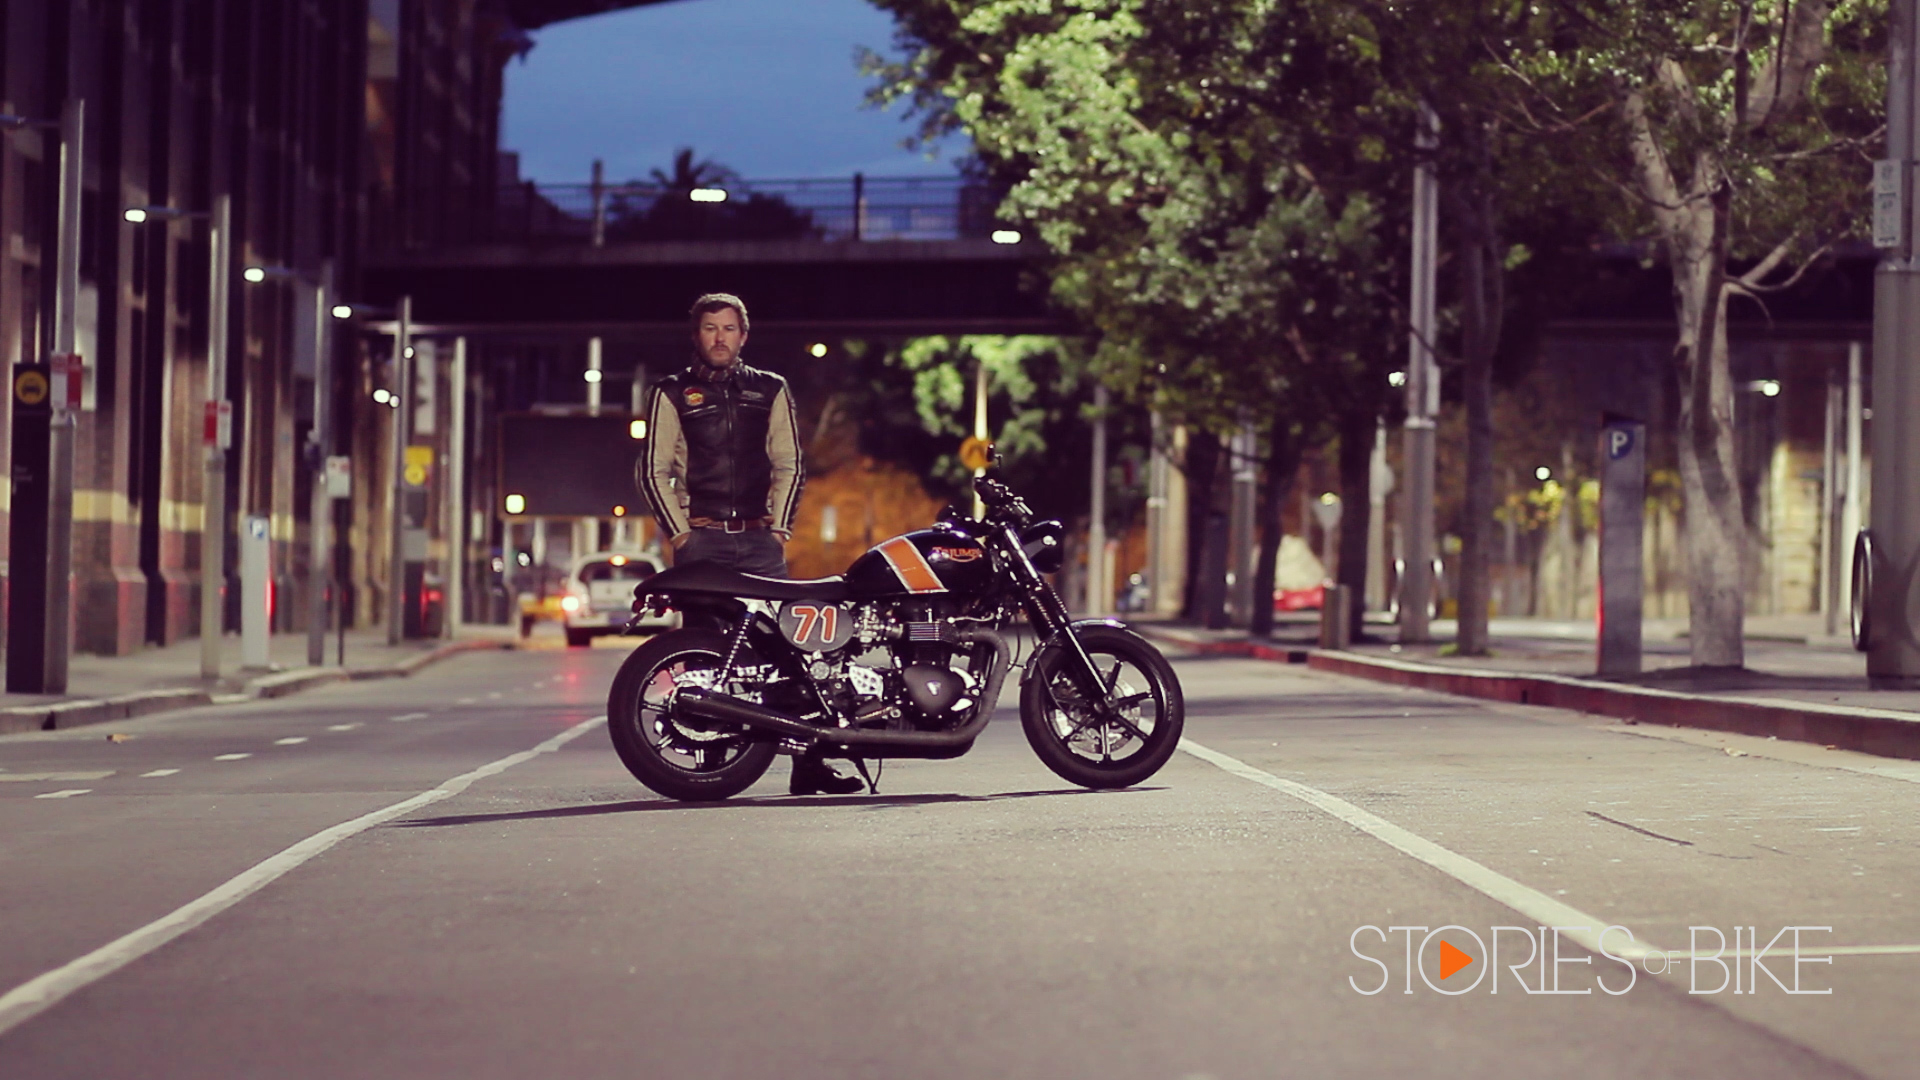 Stories_Of_Bike_Episode6_10.jpg